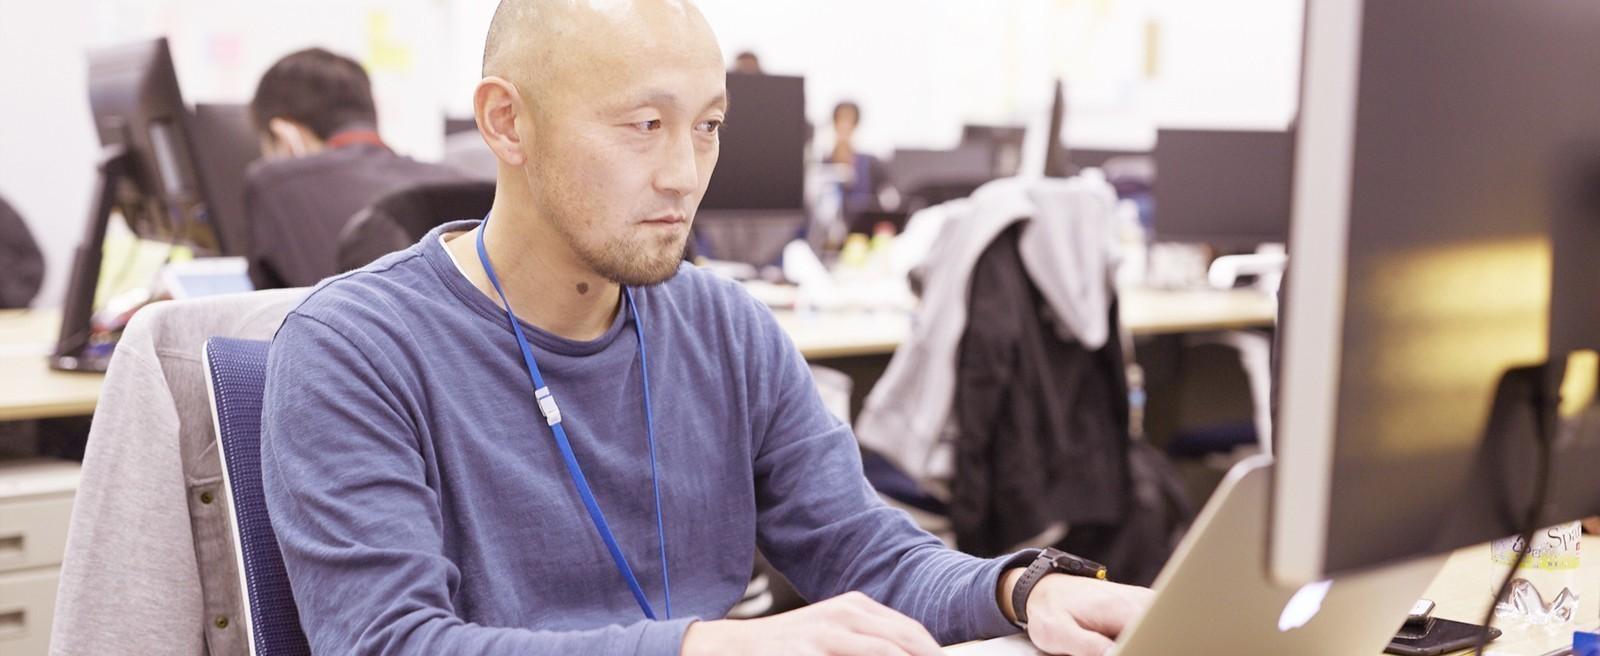 KDDIグループ・黎明期の巨大ECプラットフォームをさらにスケールをさせるプロダクトマネージャー